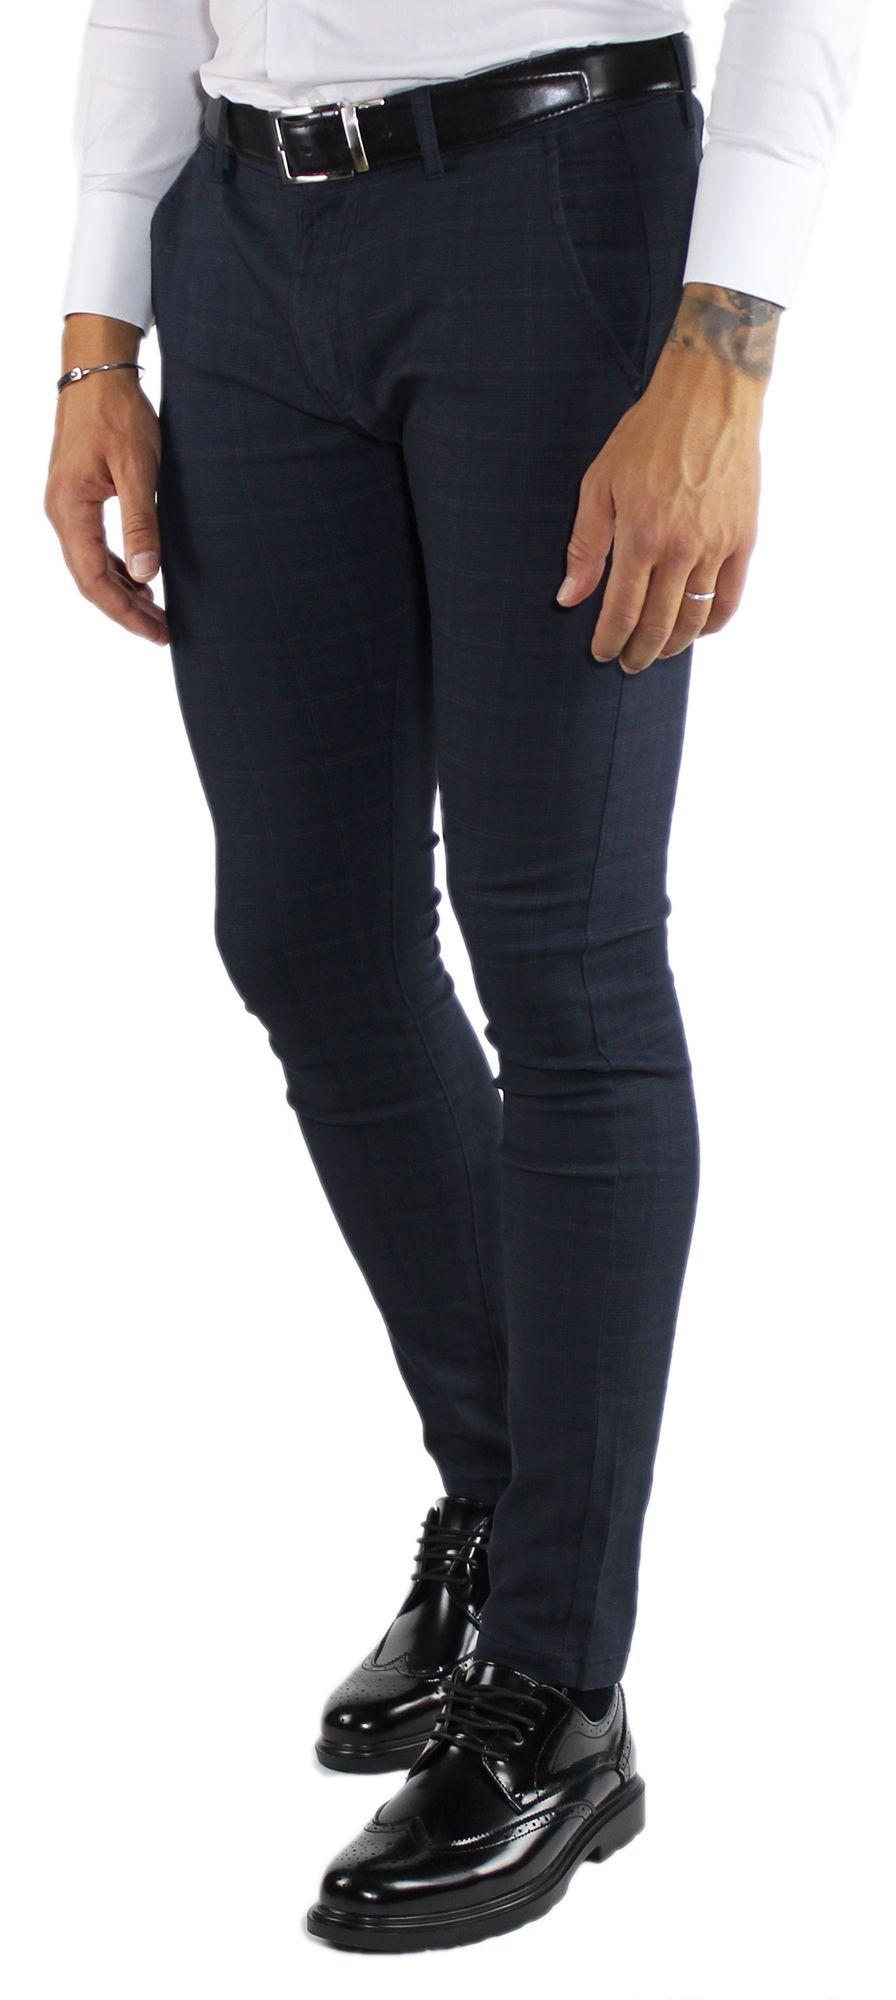 Pantaloni-Uomo-Invernali-a-Quadri-Eleganti-Pantalone-Slim-Fit-Elasticizzati-Scoz miniatura 7